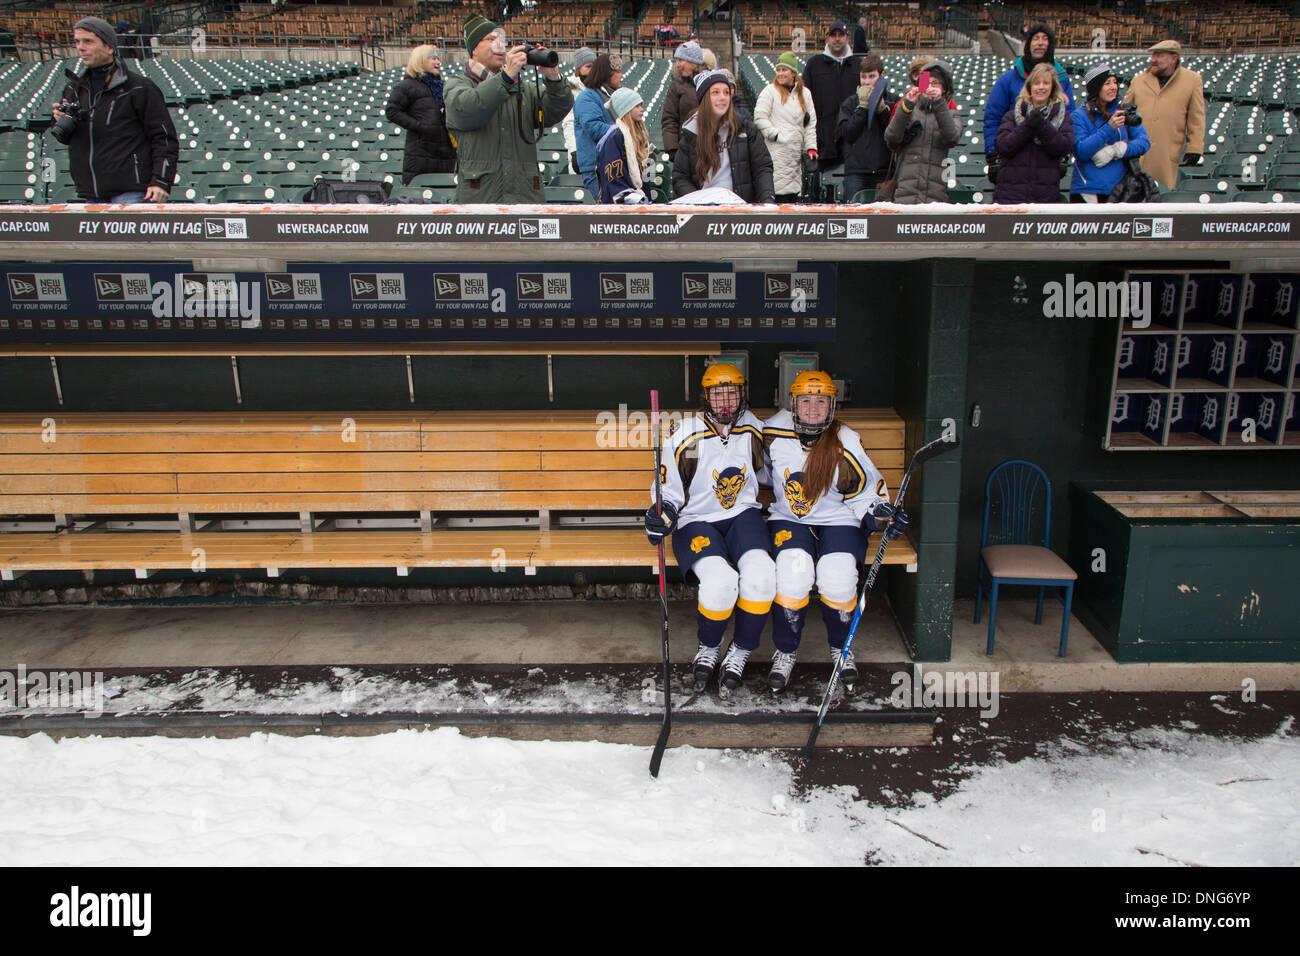 High School Girls Hockey sur Glace Photo Stock